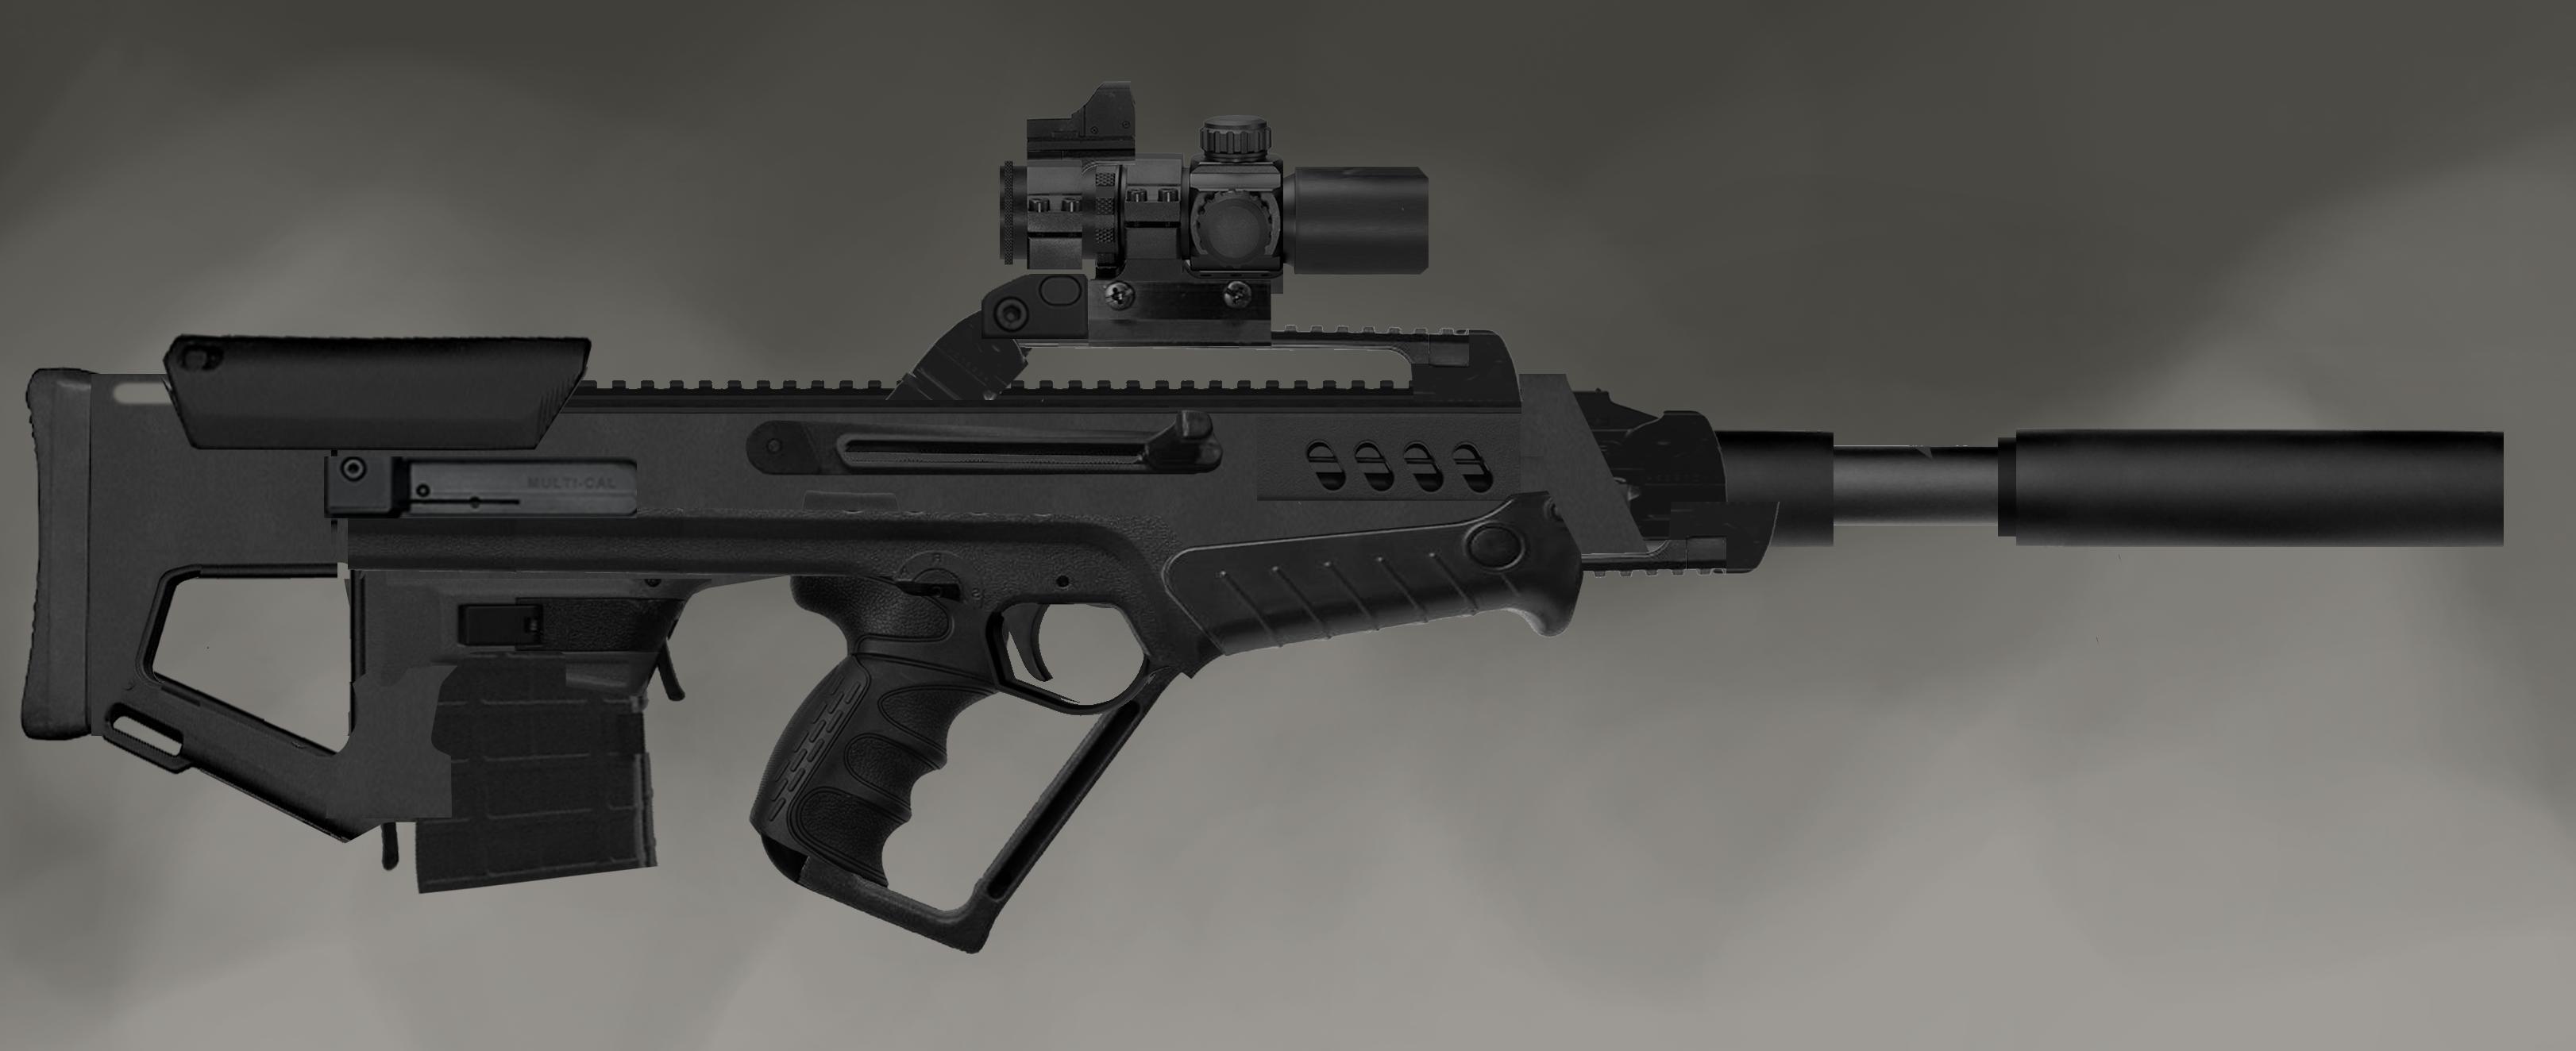 sniper rifle concept image orbital assault mod db